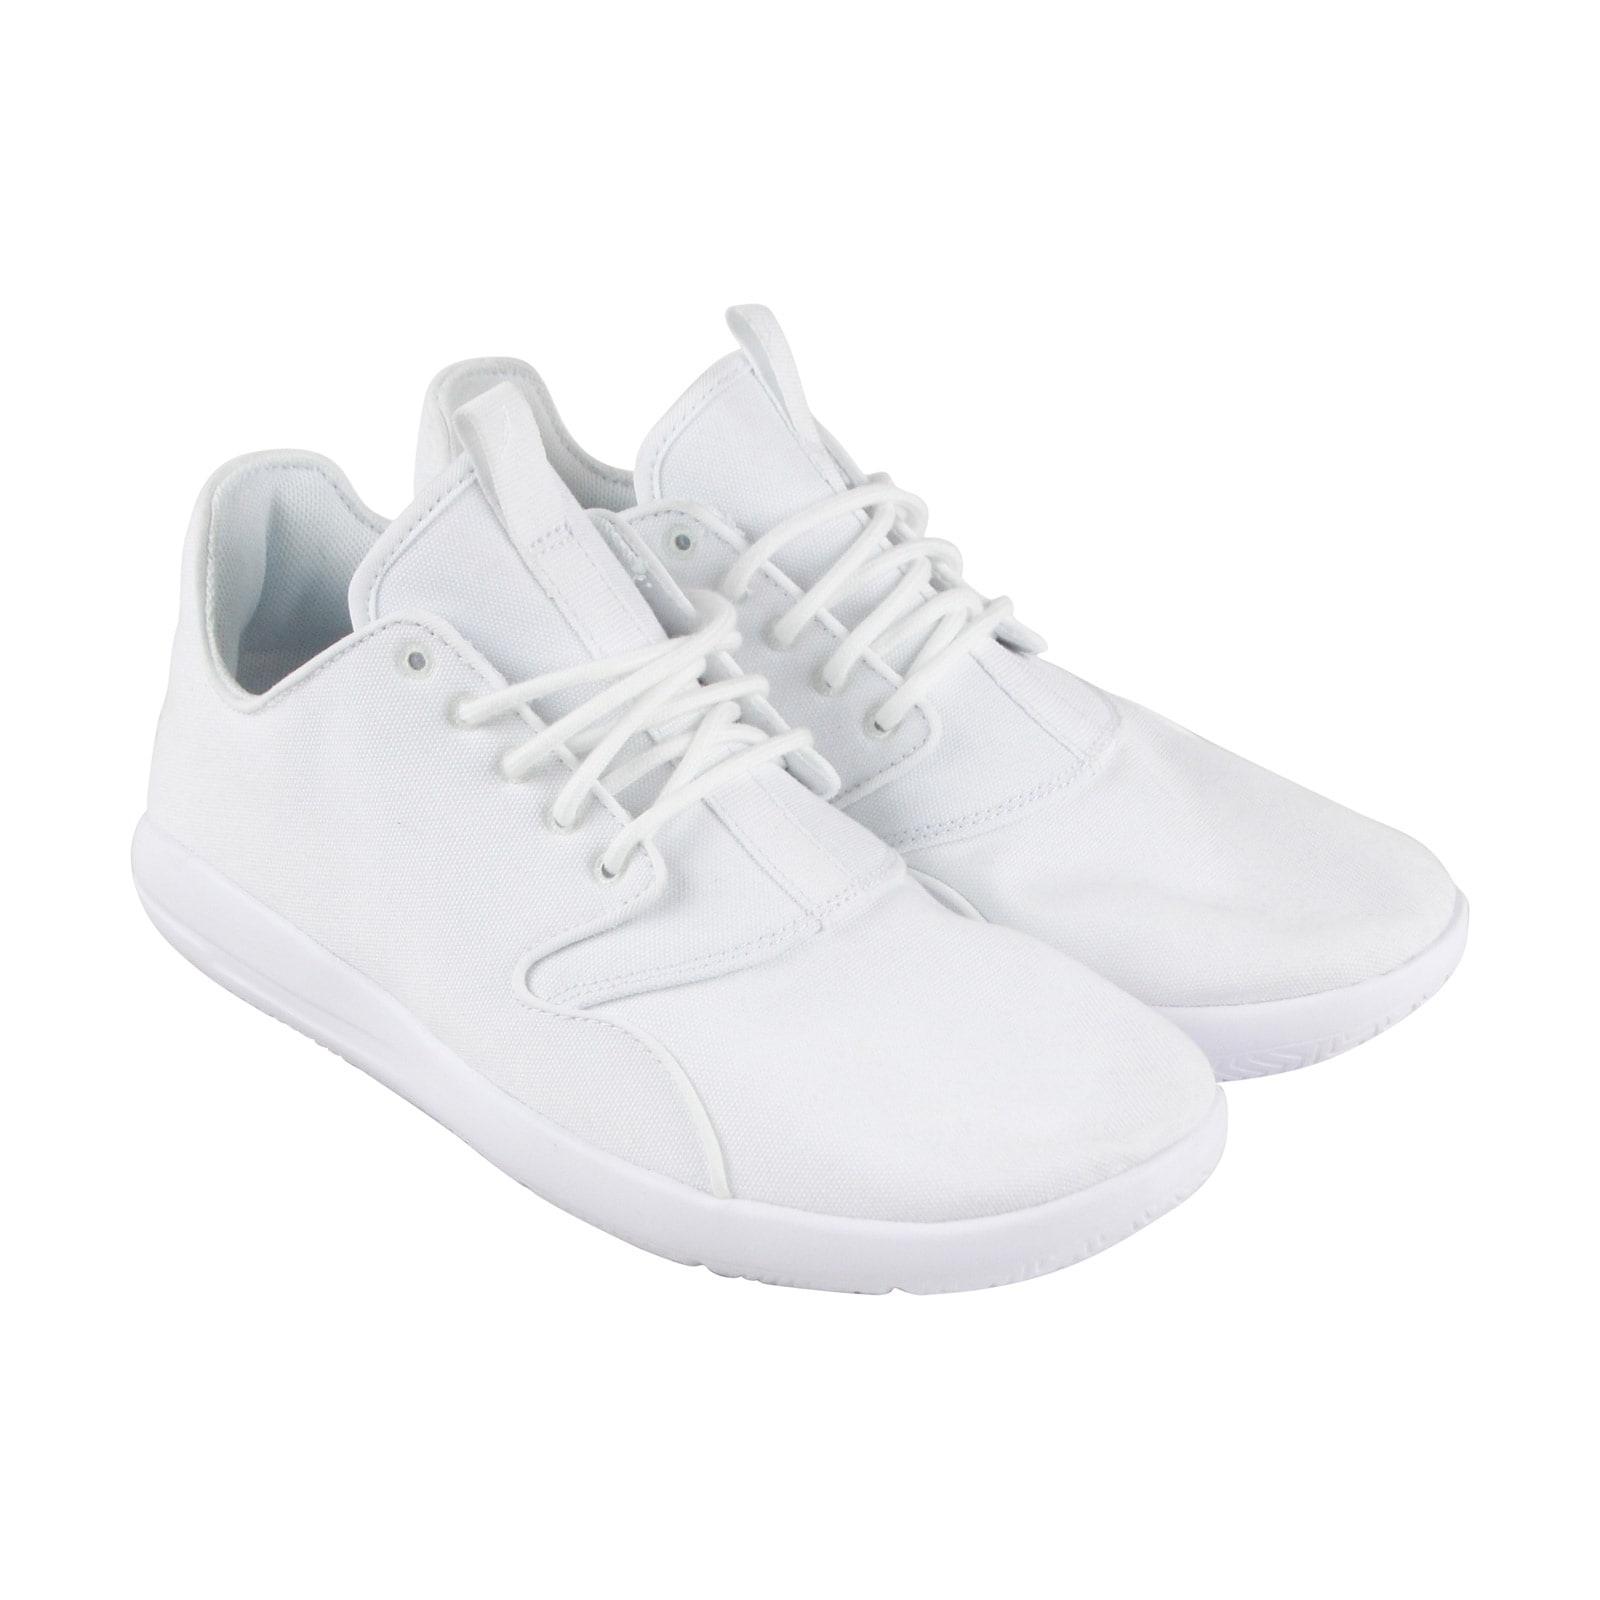 Shop Jordan Jordan Eclipse Mens White